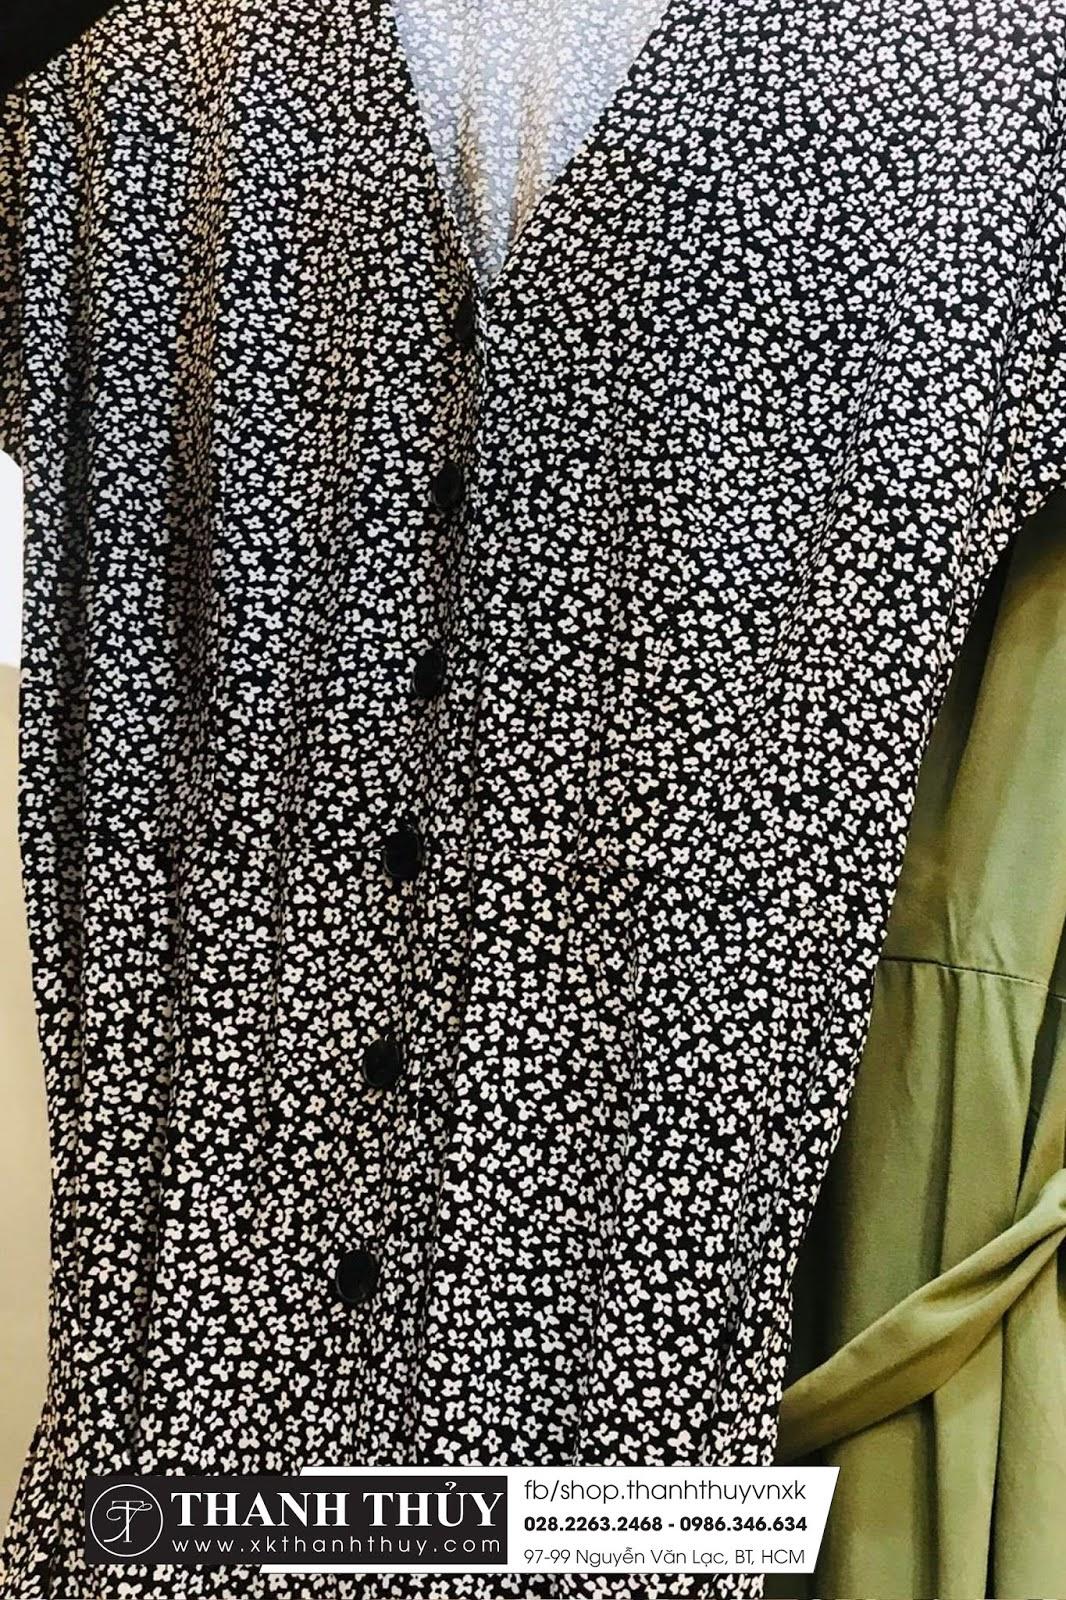 Đầm sơ mi Ware House vải lanh mềm mịn